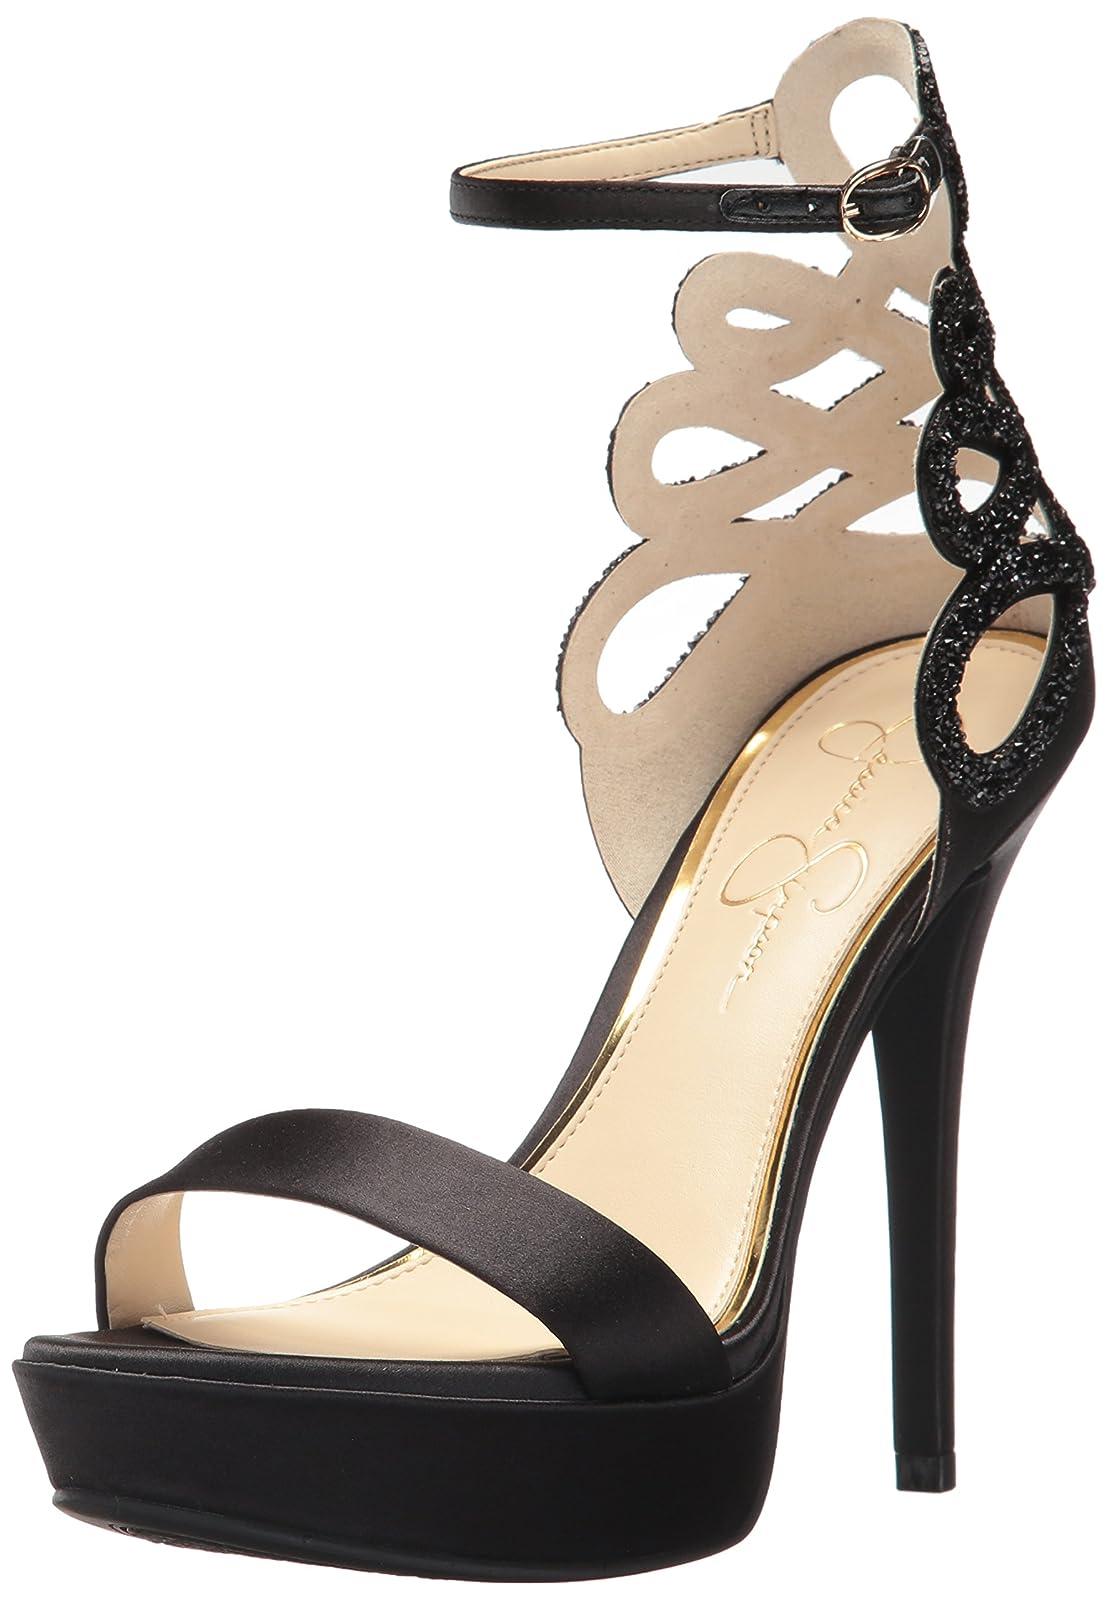 Jessica Simpson Women's BAYVINN Heeled Sandal US - 1